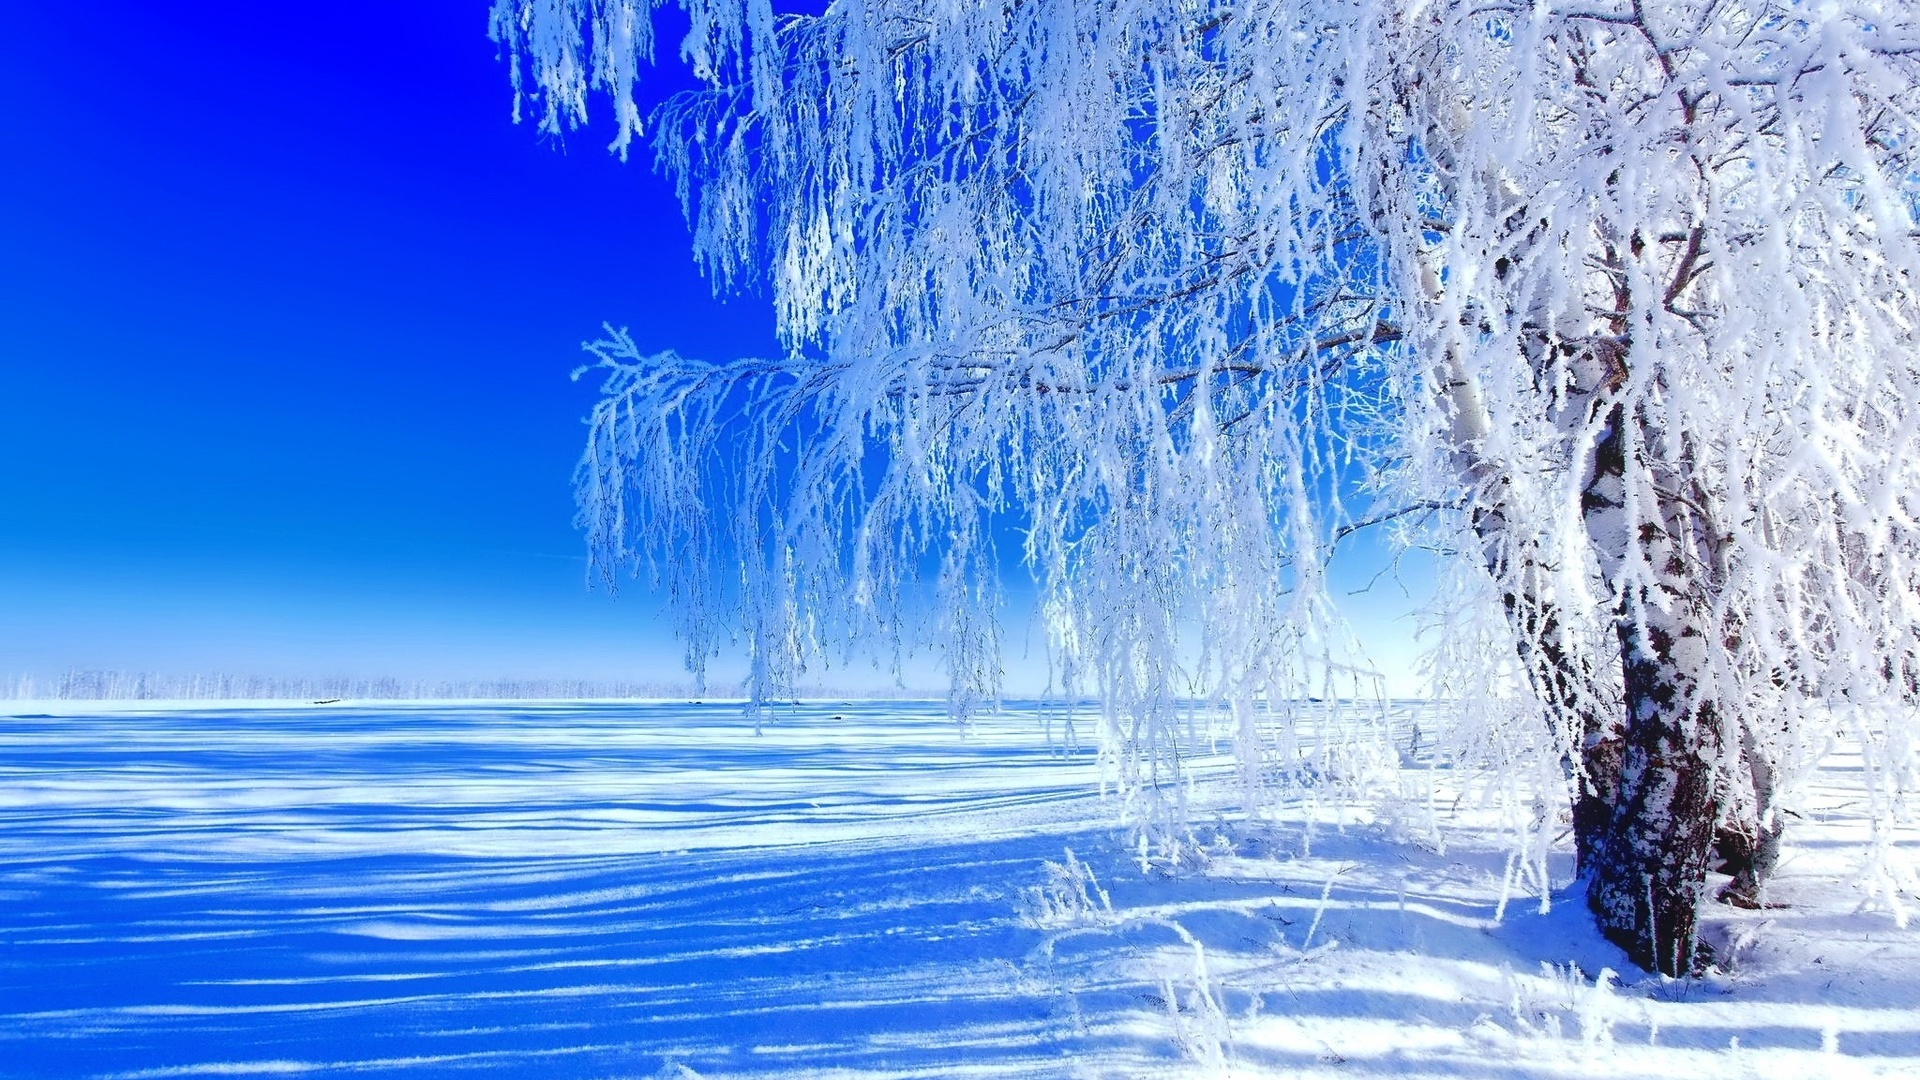 Анимация картинки зимние утро, картинки про